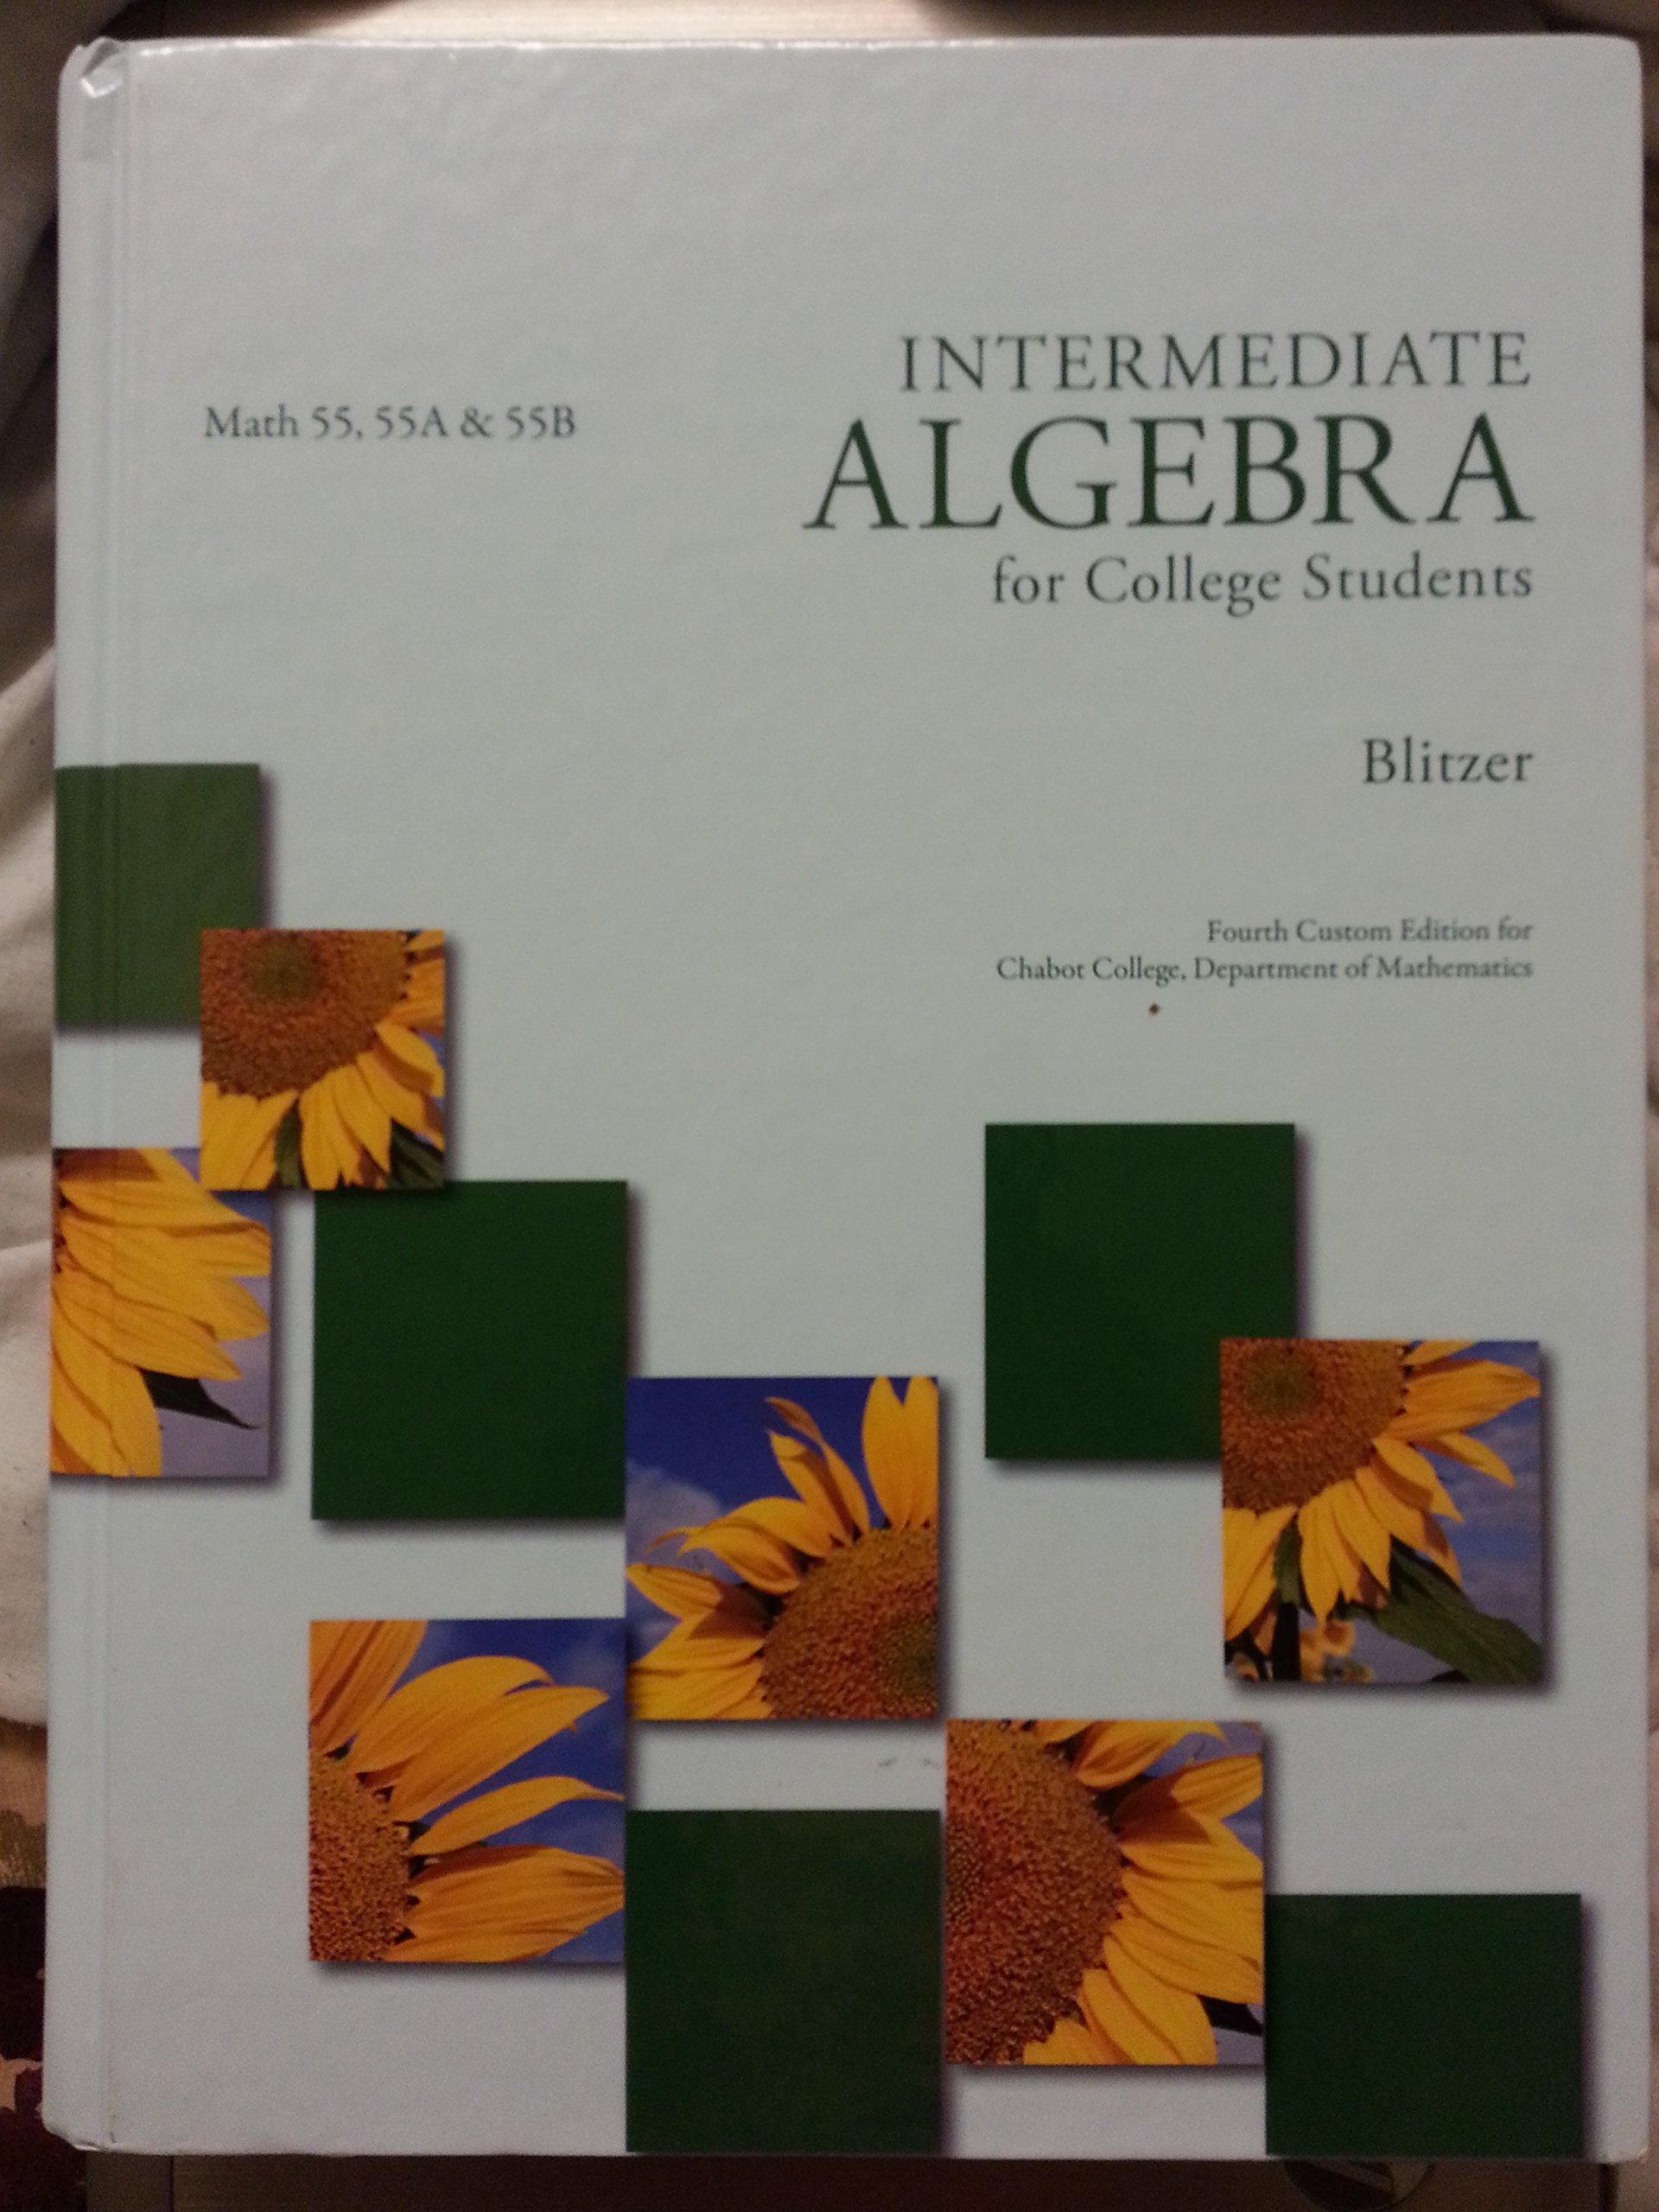 Intermediate Algebra for College Students: Robert Blitzer